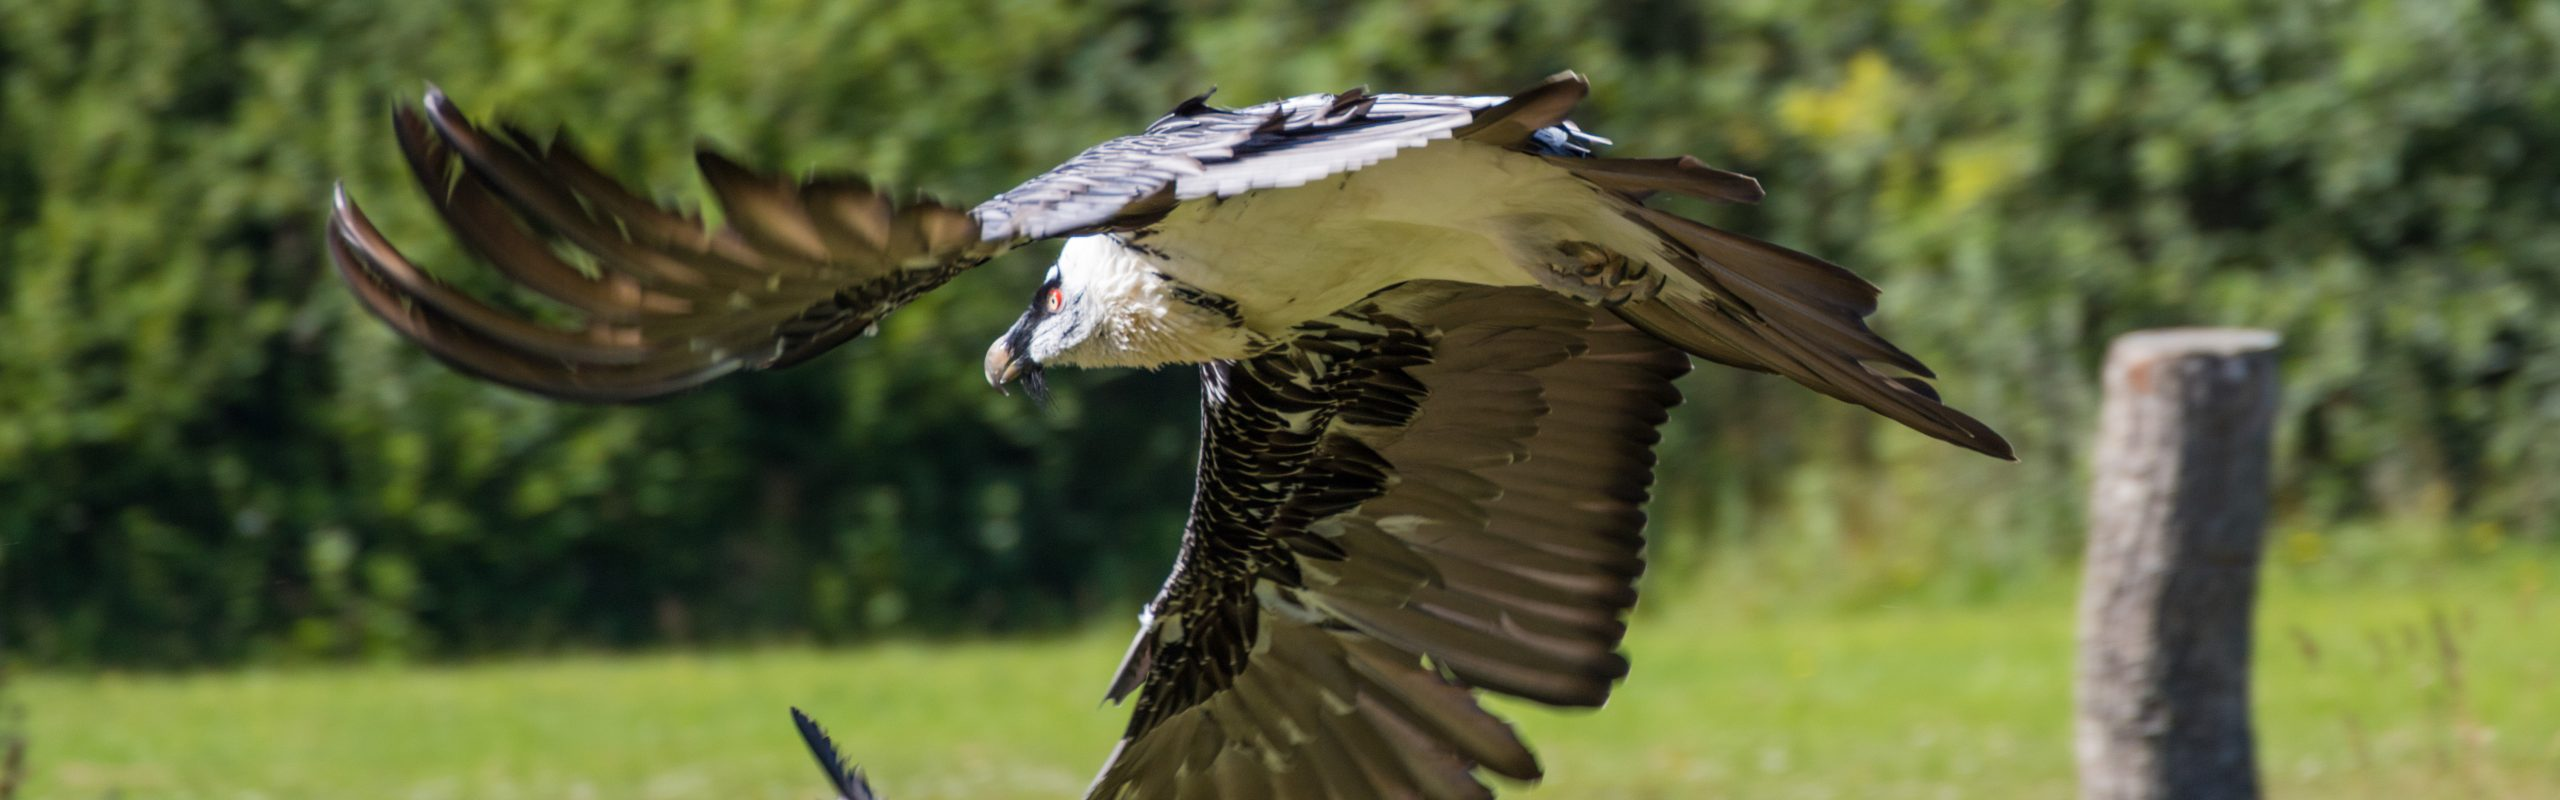 https://faunafocus.com/home/may-2018-bearded-vulture/#jp-carousel-7897